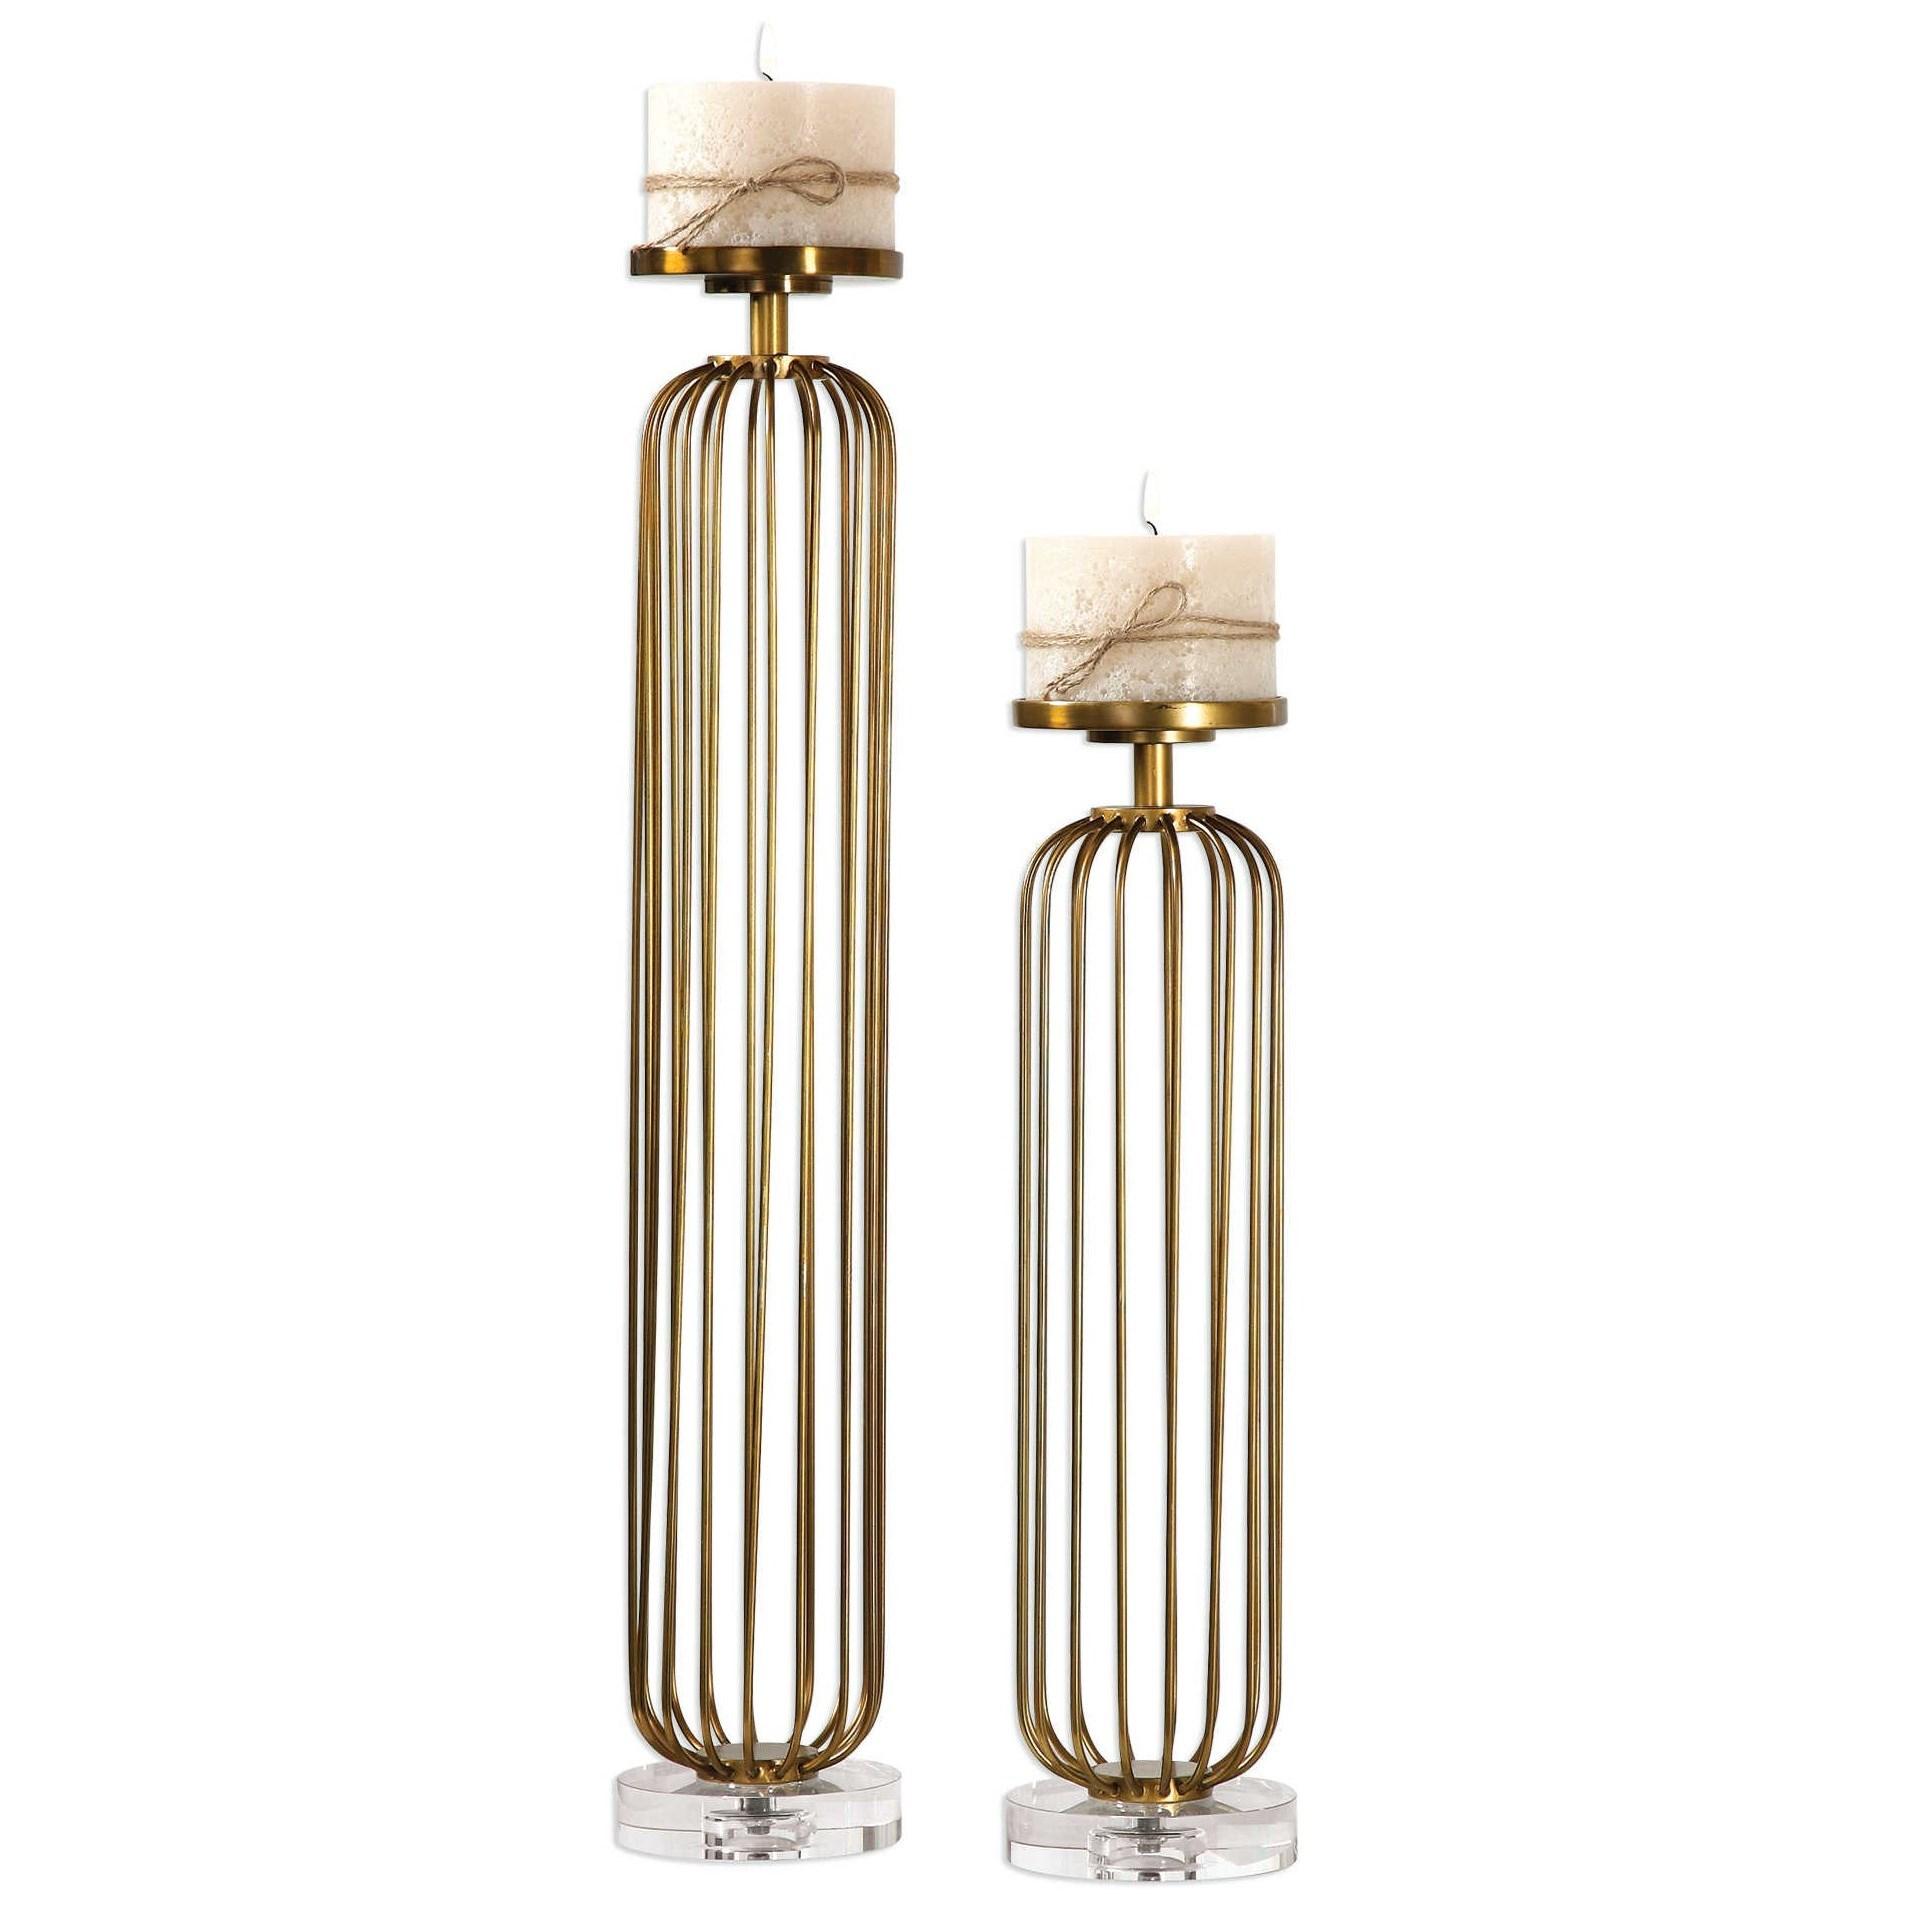 Cesinali Antique Gold Candleholders Set of 2